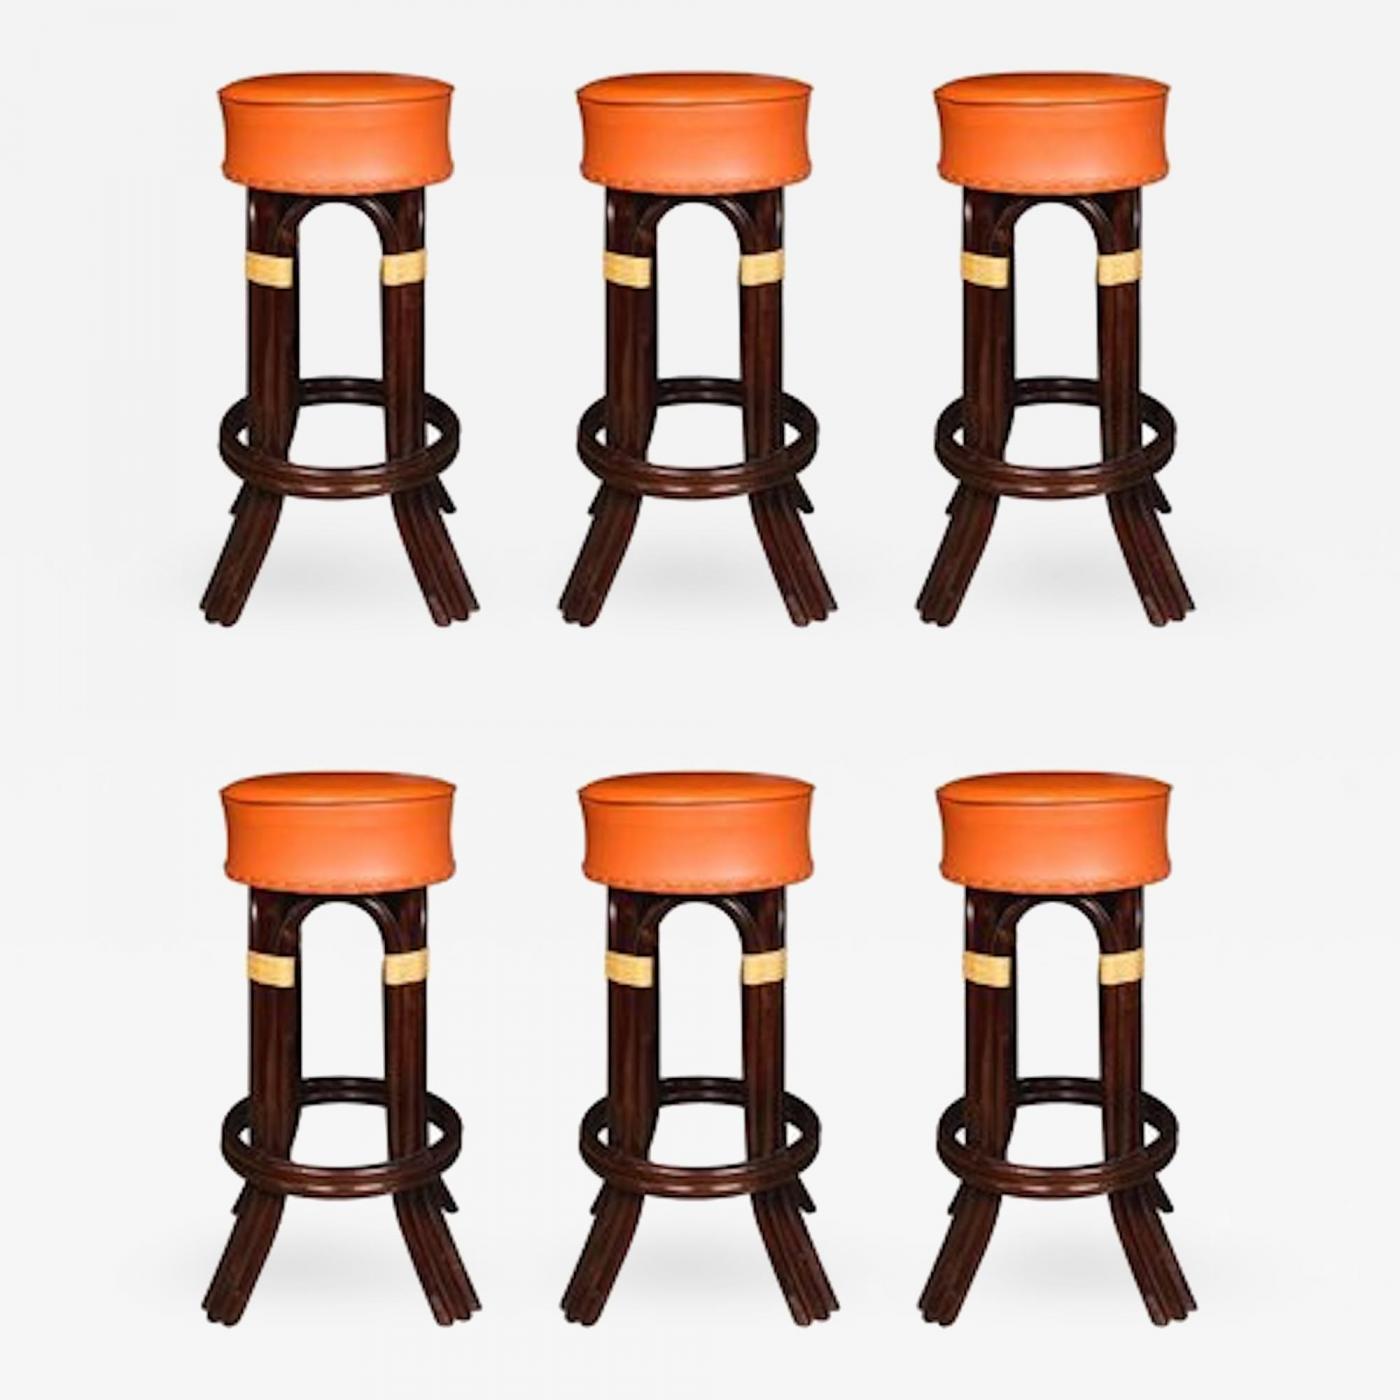 Listings furniture seating stools